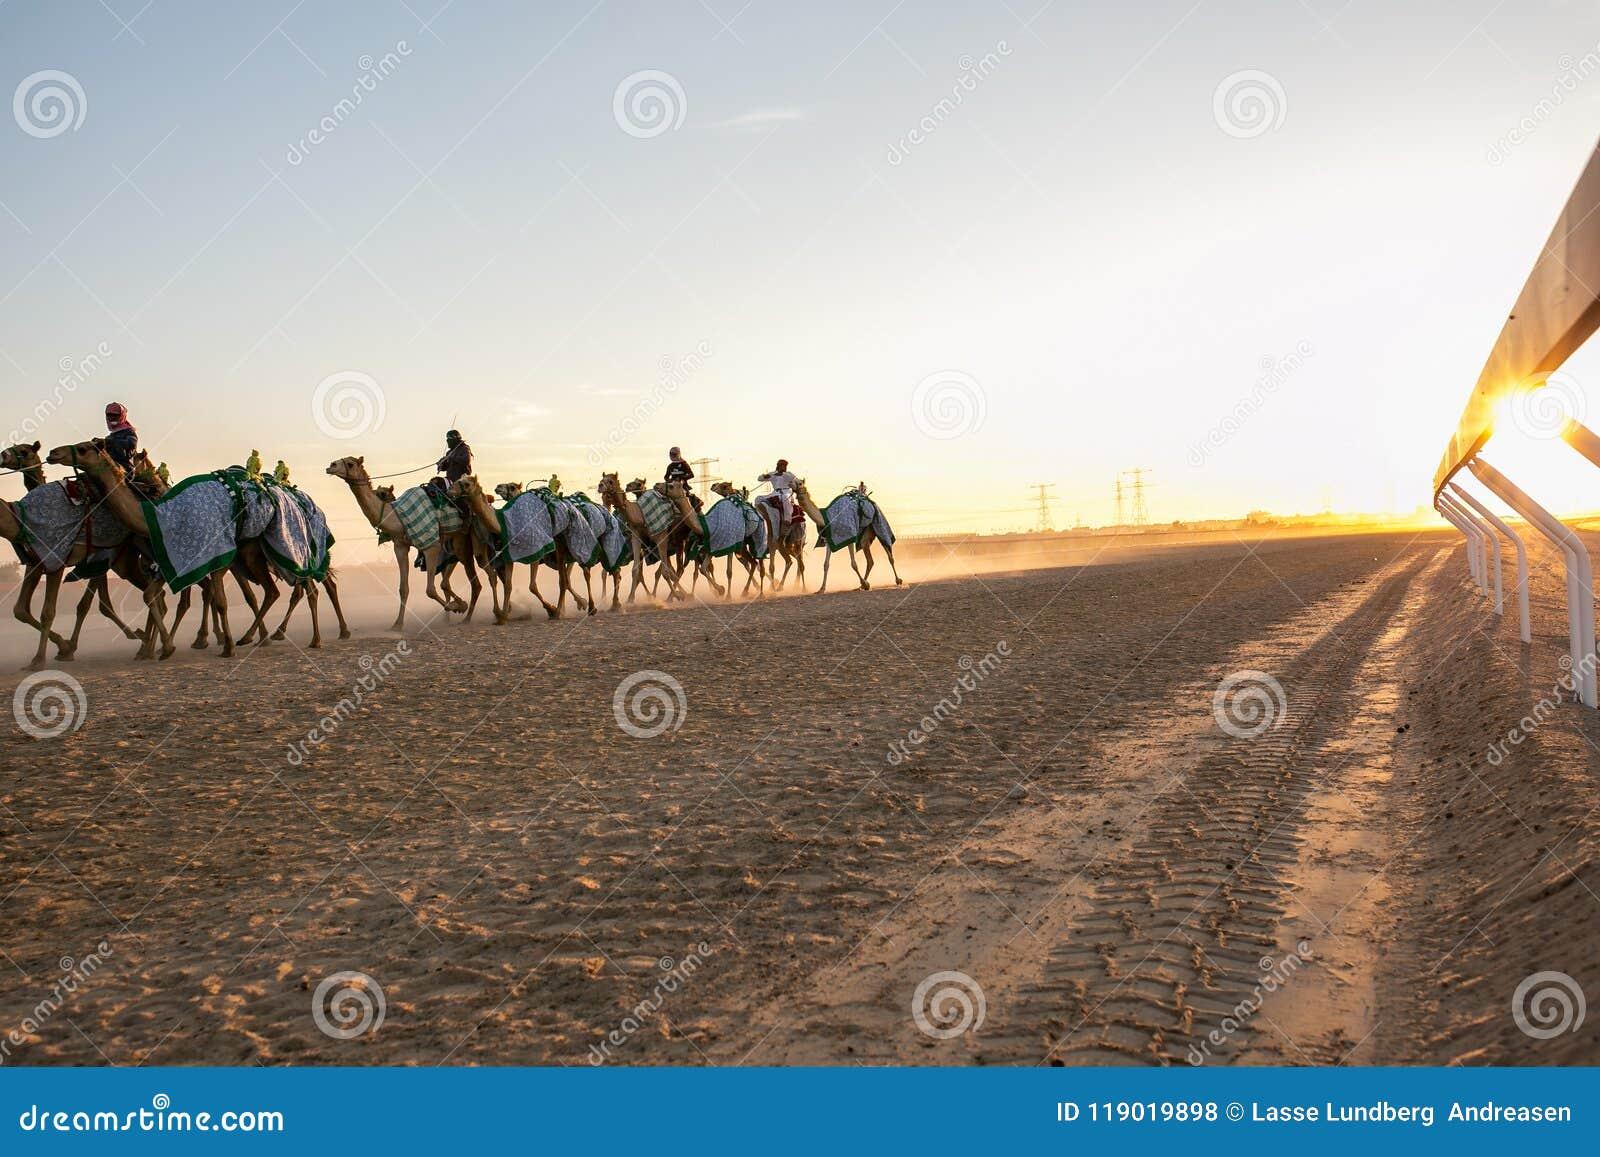 Emballage des chameaux en Abu Dhabi